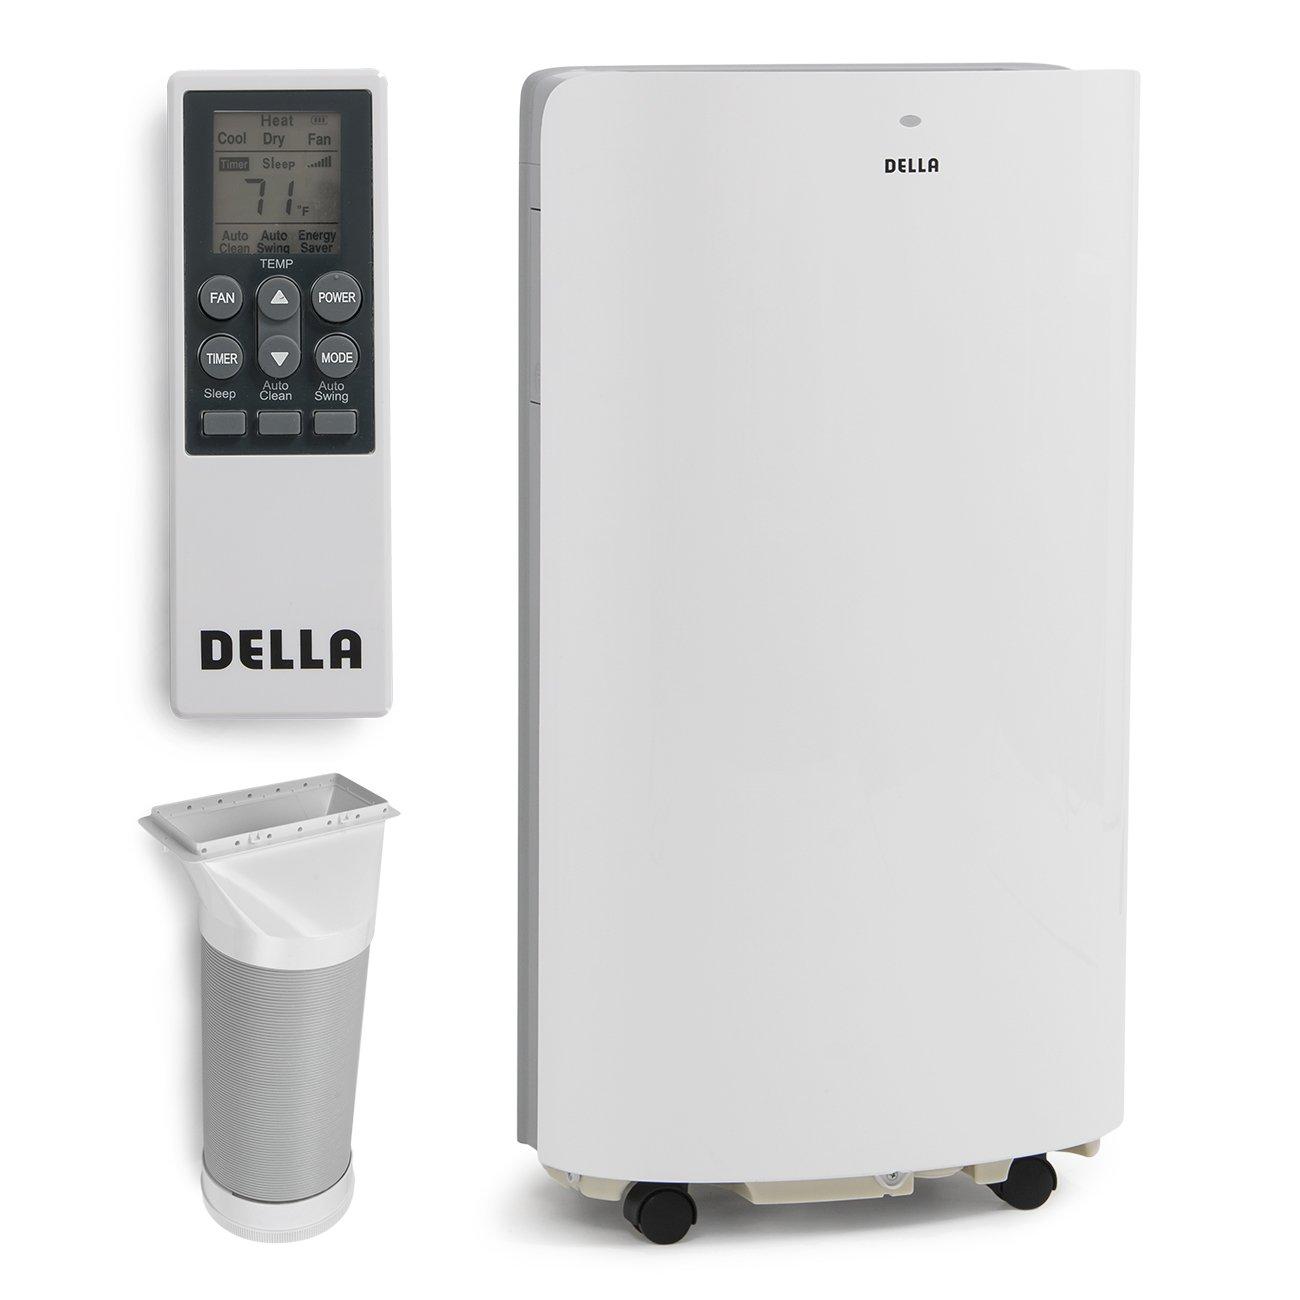 Della 14,000 BTU Evaporative Portable Air Conditioner / Heater / Dehumidifier / Cooling Function LED Panel Control